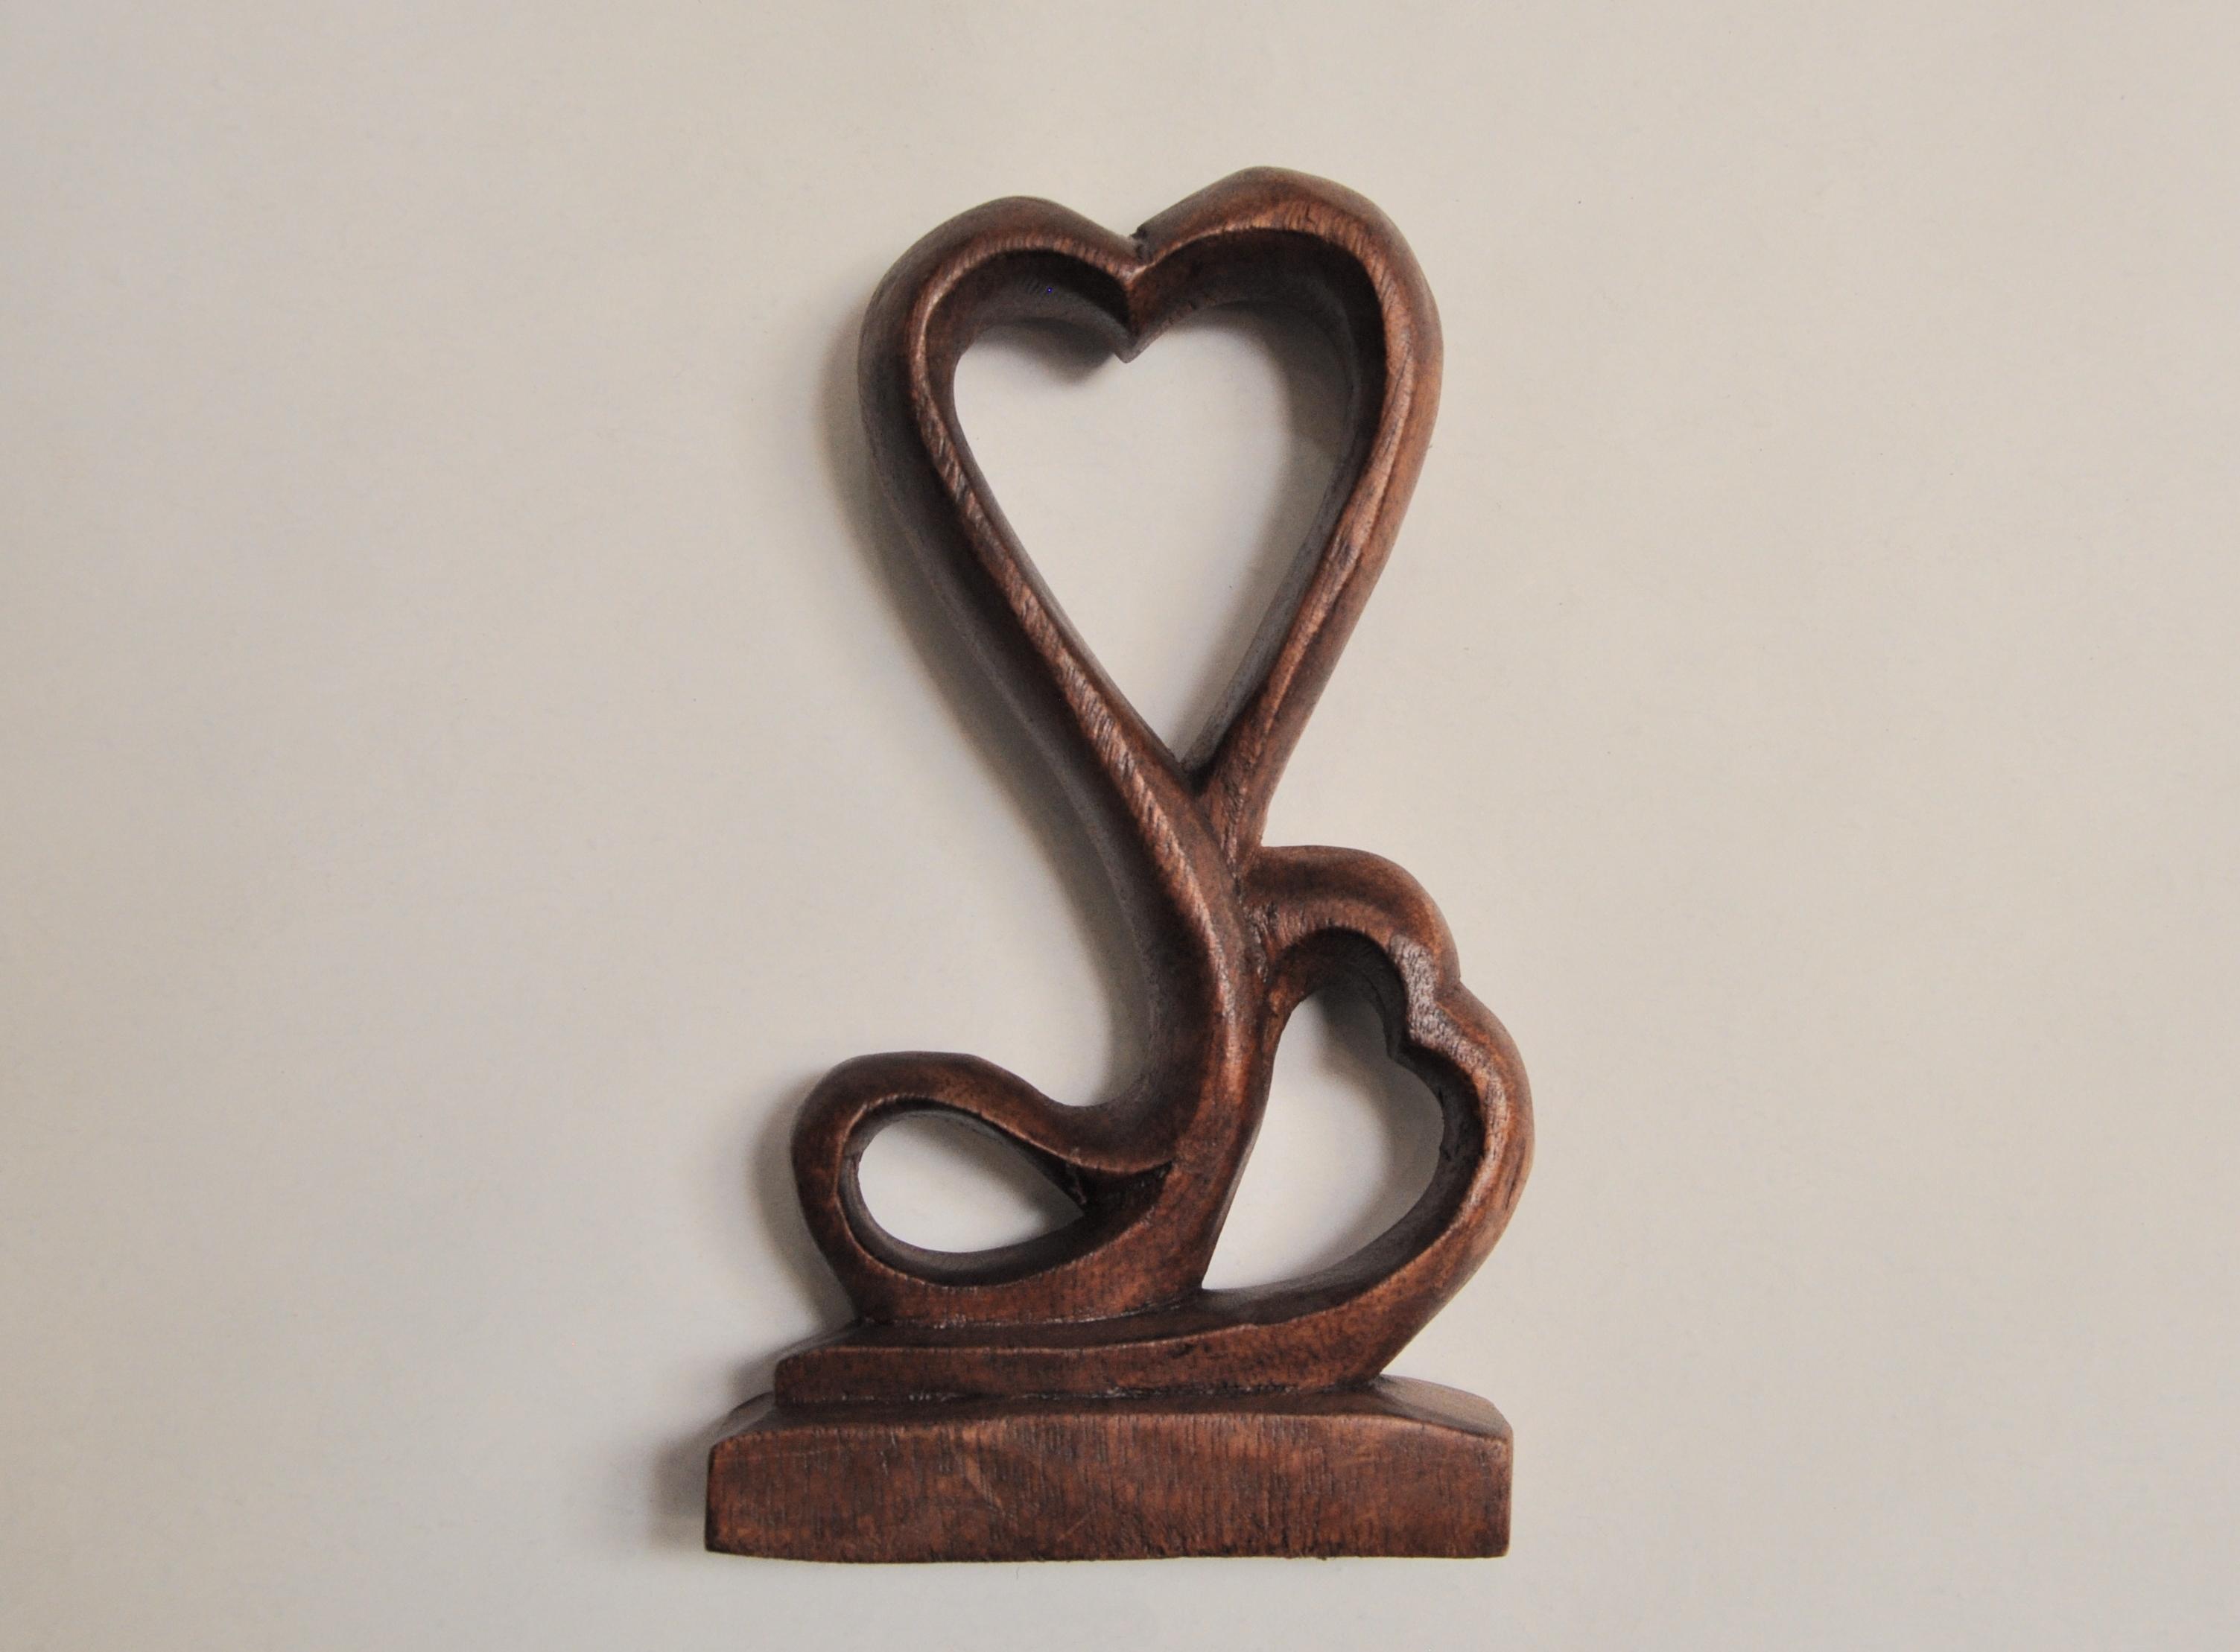 статуэтка деревянная сердце